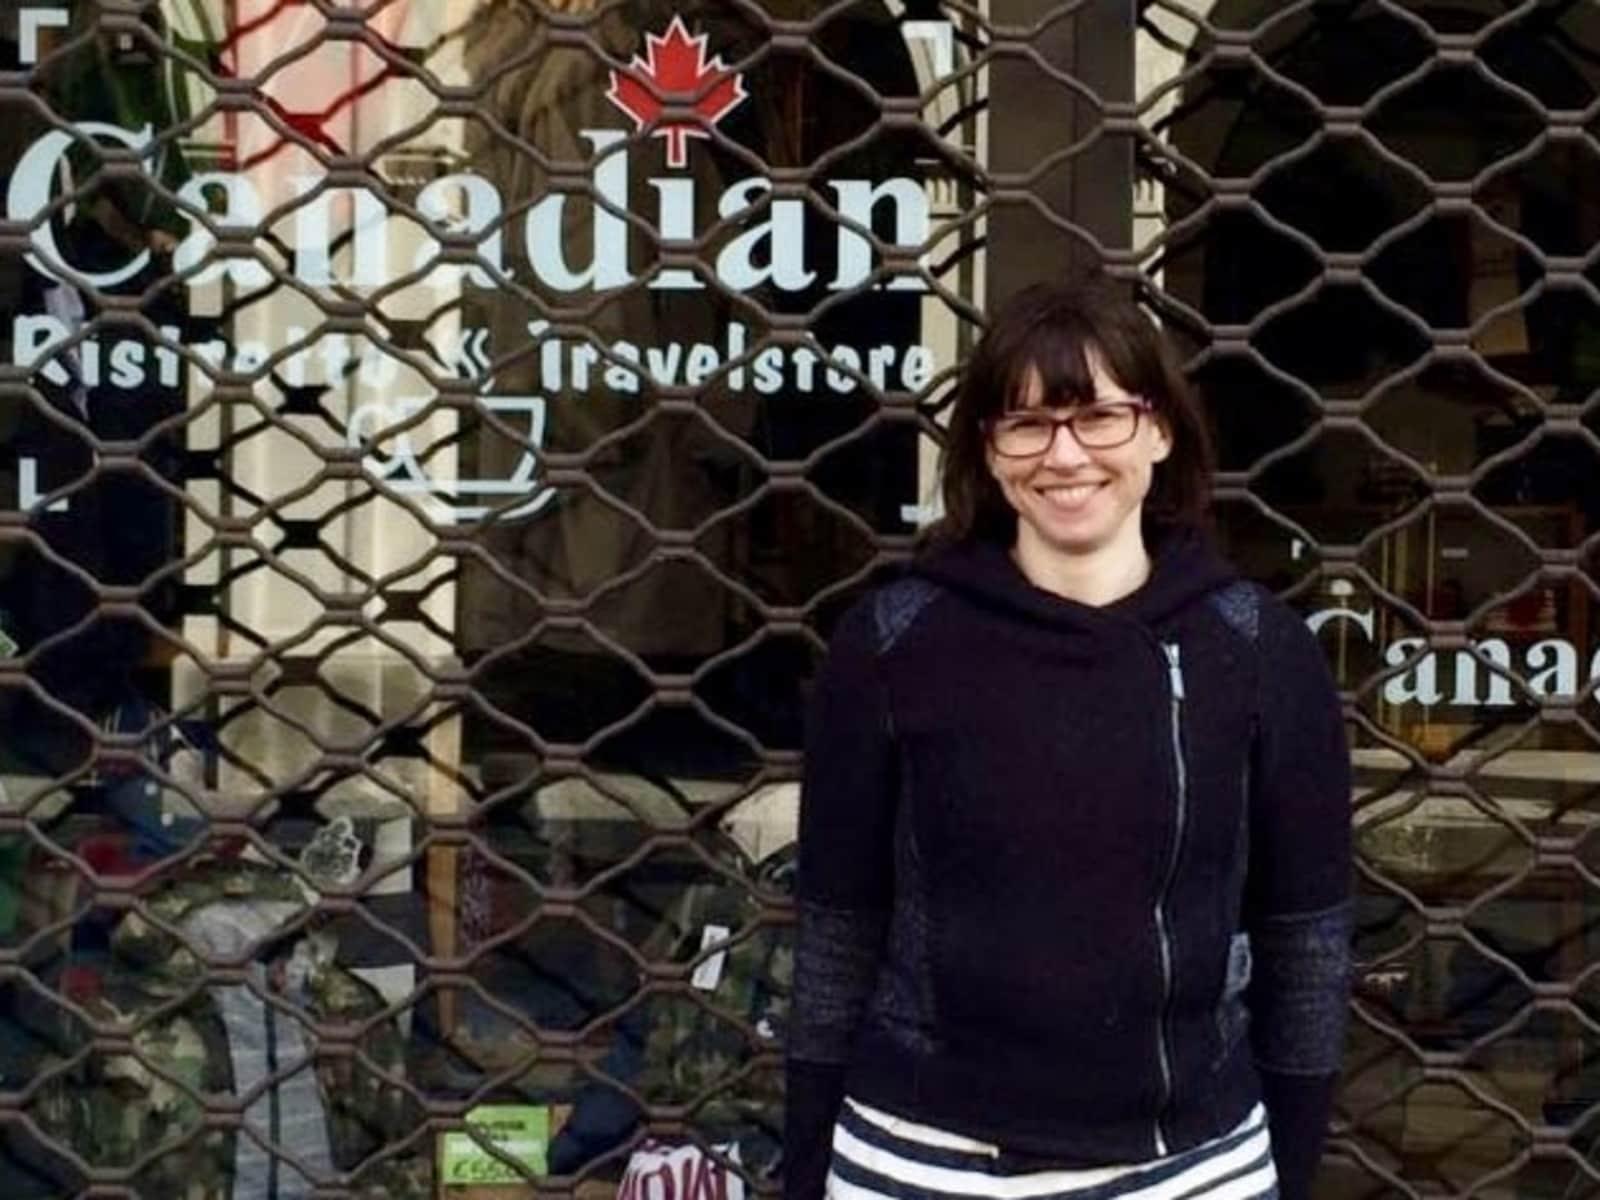 Donnafay from Etobicoke, Ontario, Canada